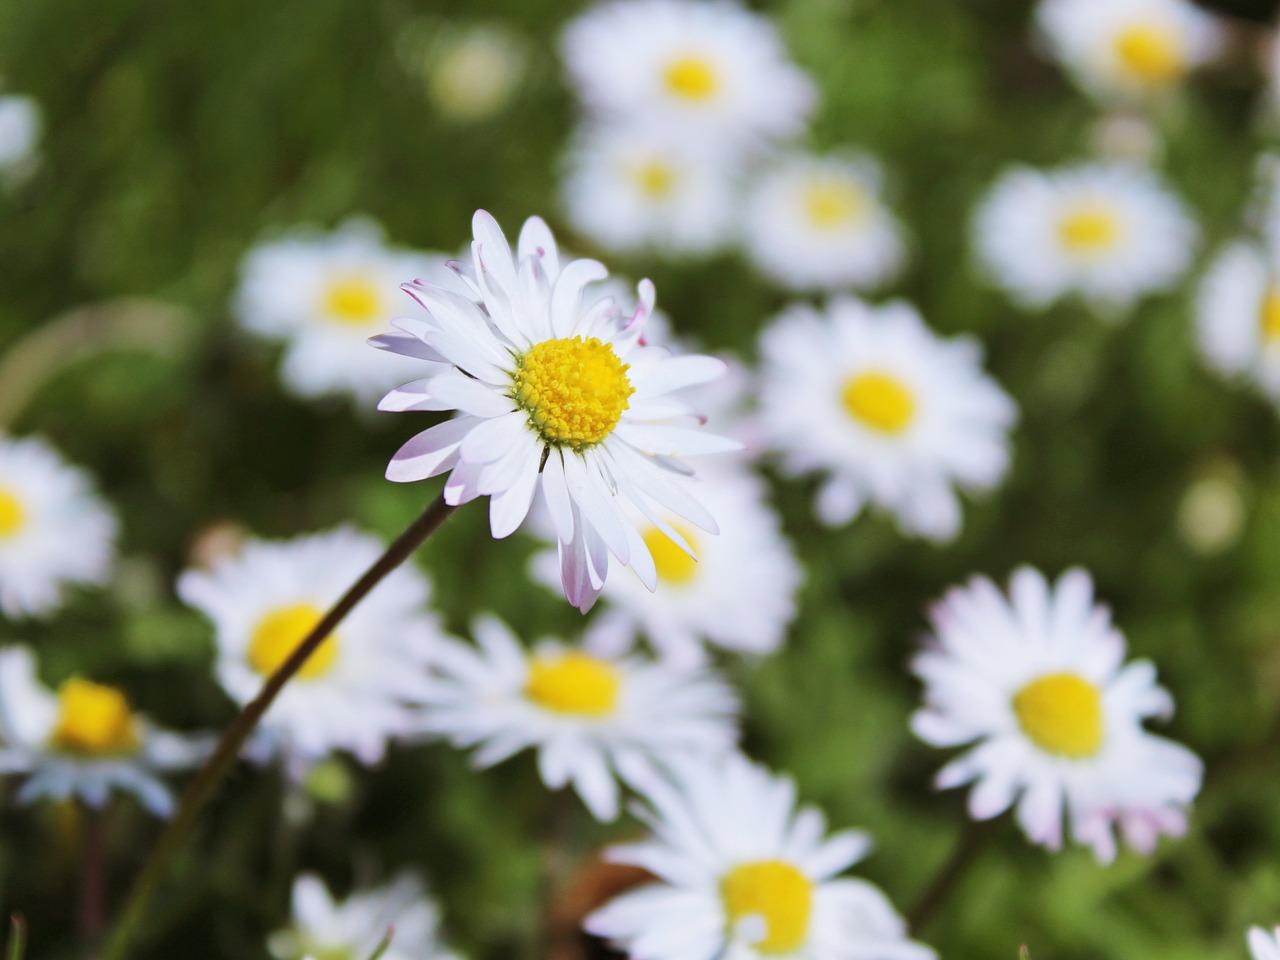 Daisymeadowflowerswhitespring free photo from needpix daisymeadowflowerswhitespringnaturewildflowersgreen mightylinksfo